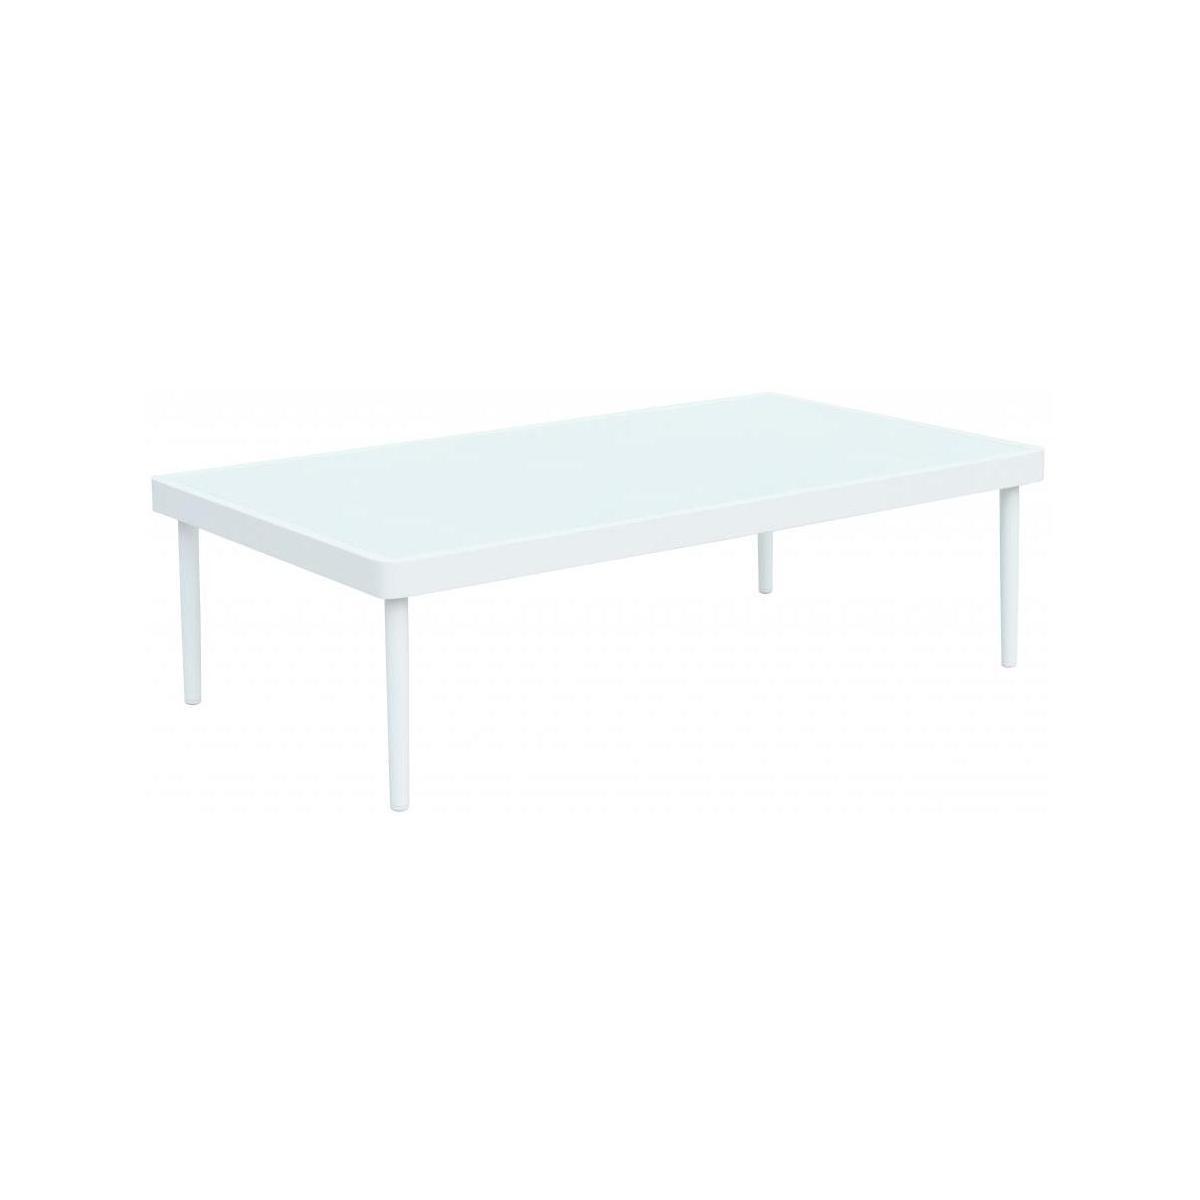 Table Basse De Jardin En Aluminium Et Verre Trempé - Blanc tout Table De Jardin Aluminium Et Verre